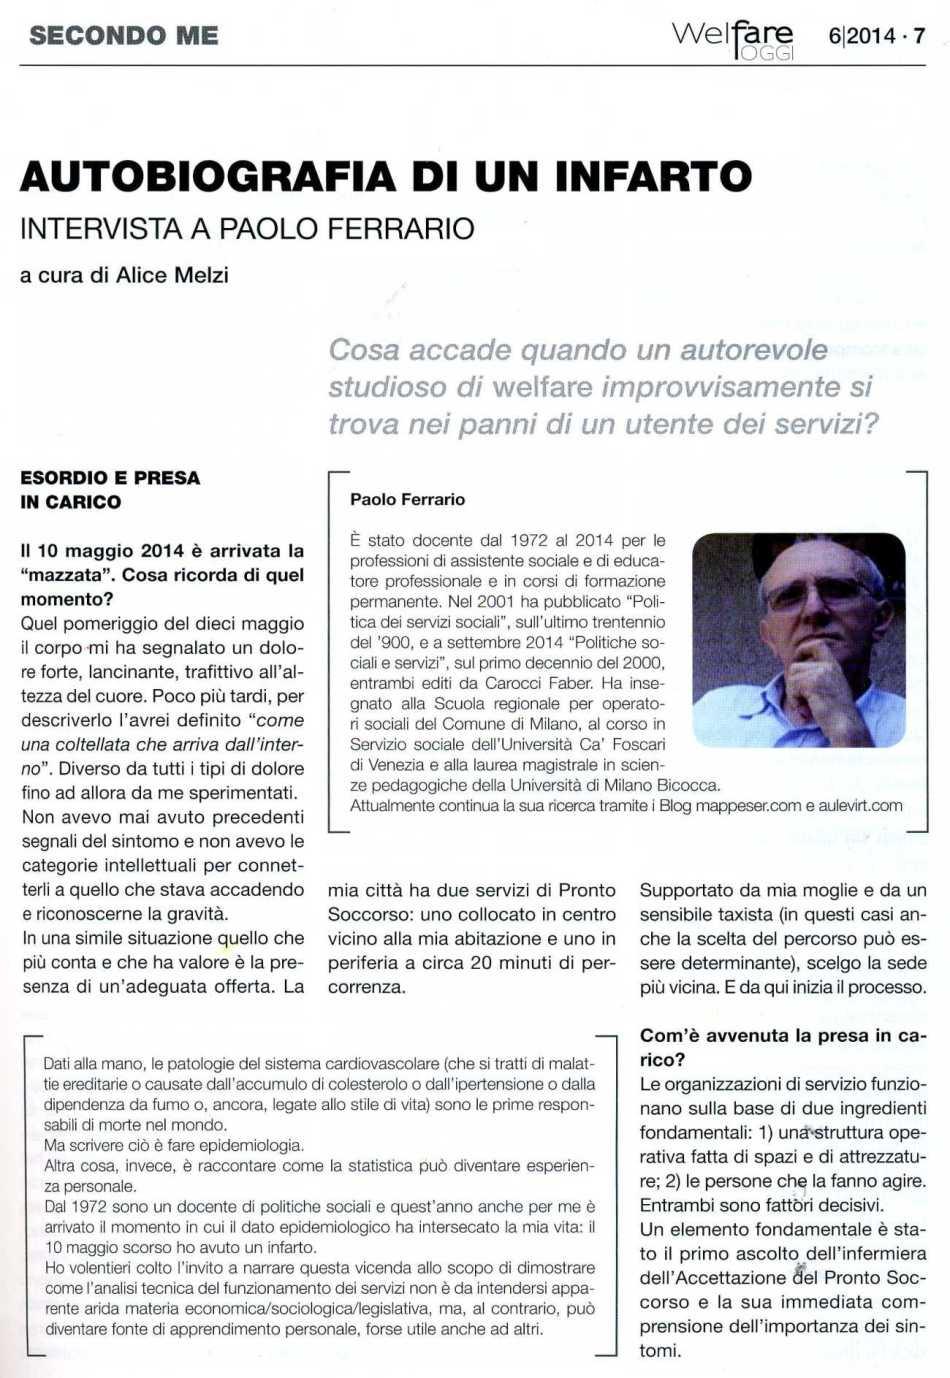 autobio infa ws 6-20141956